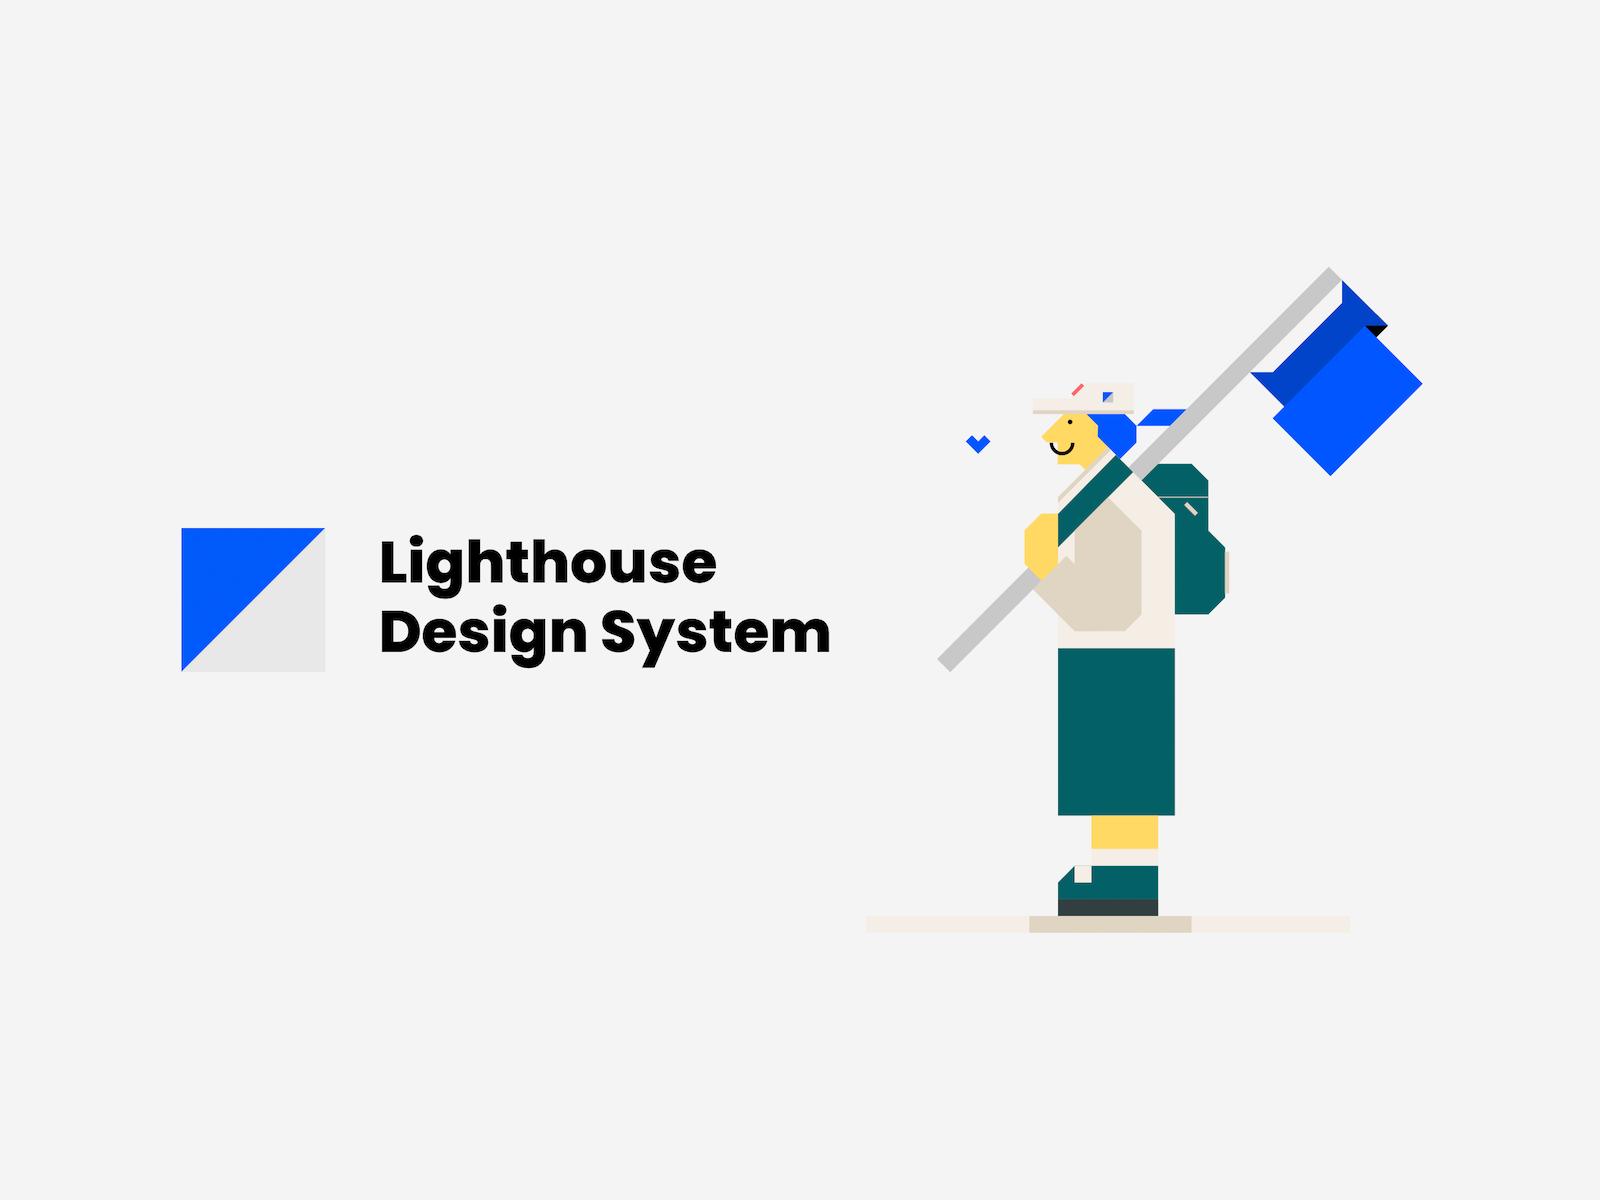 Lighthouse Design System